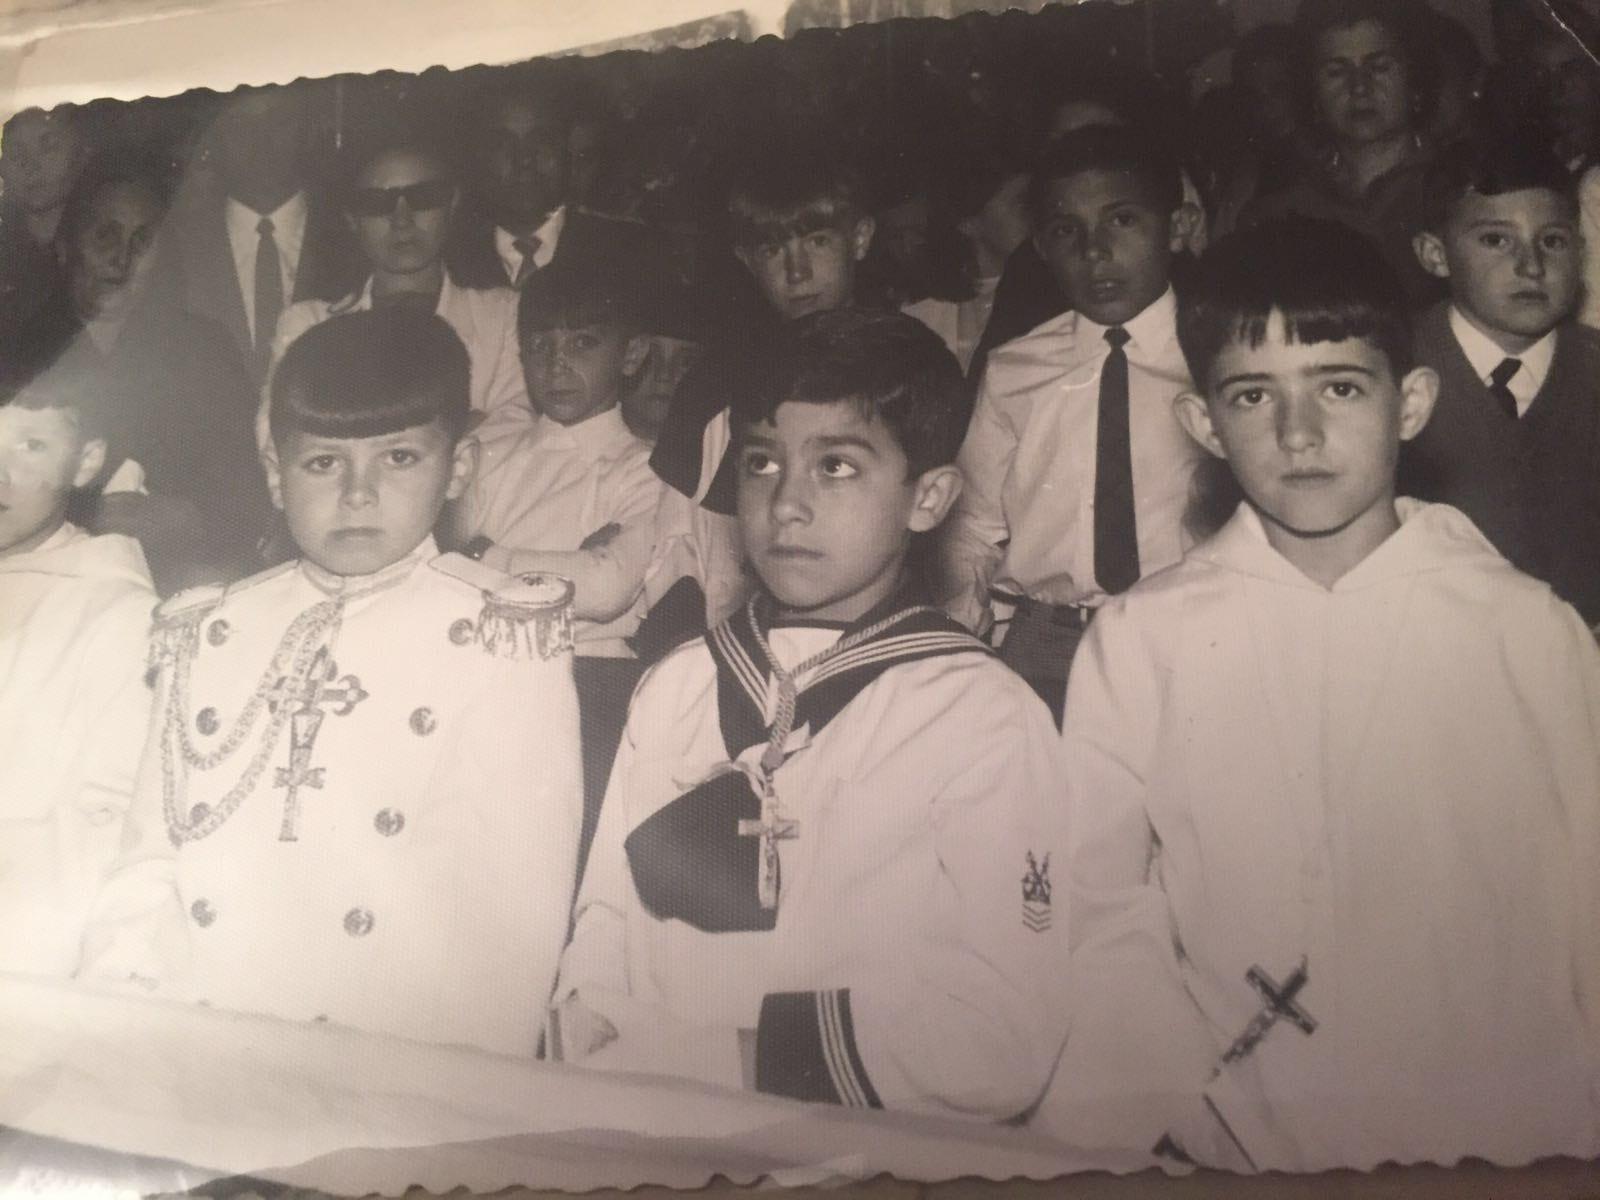 1.- , 2.- Daniel Martín, 3.- Marcelino Muñoz